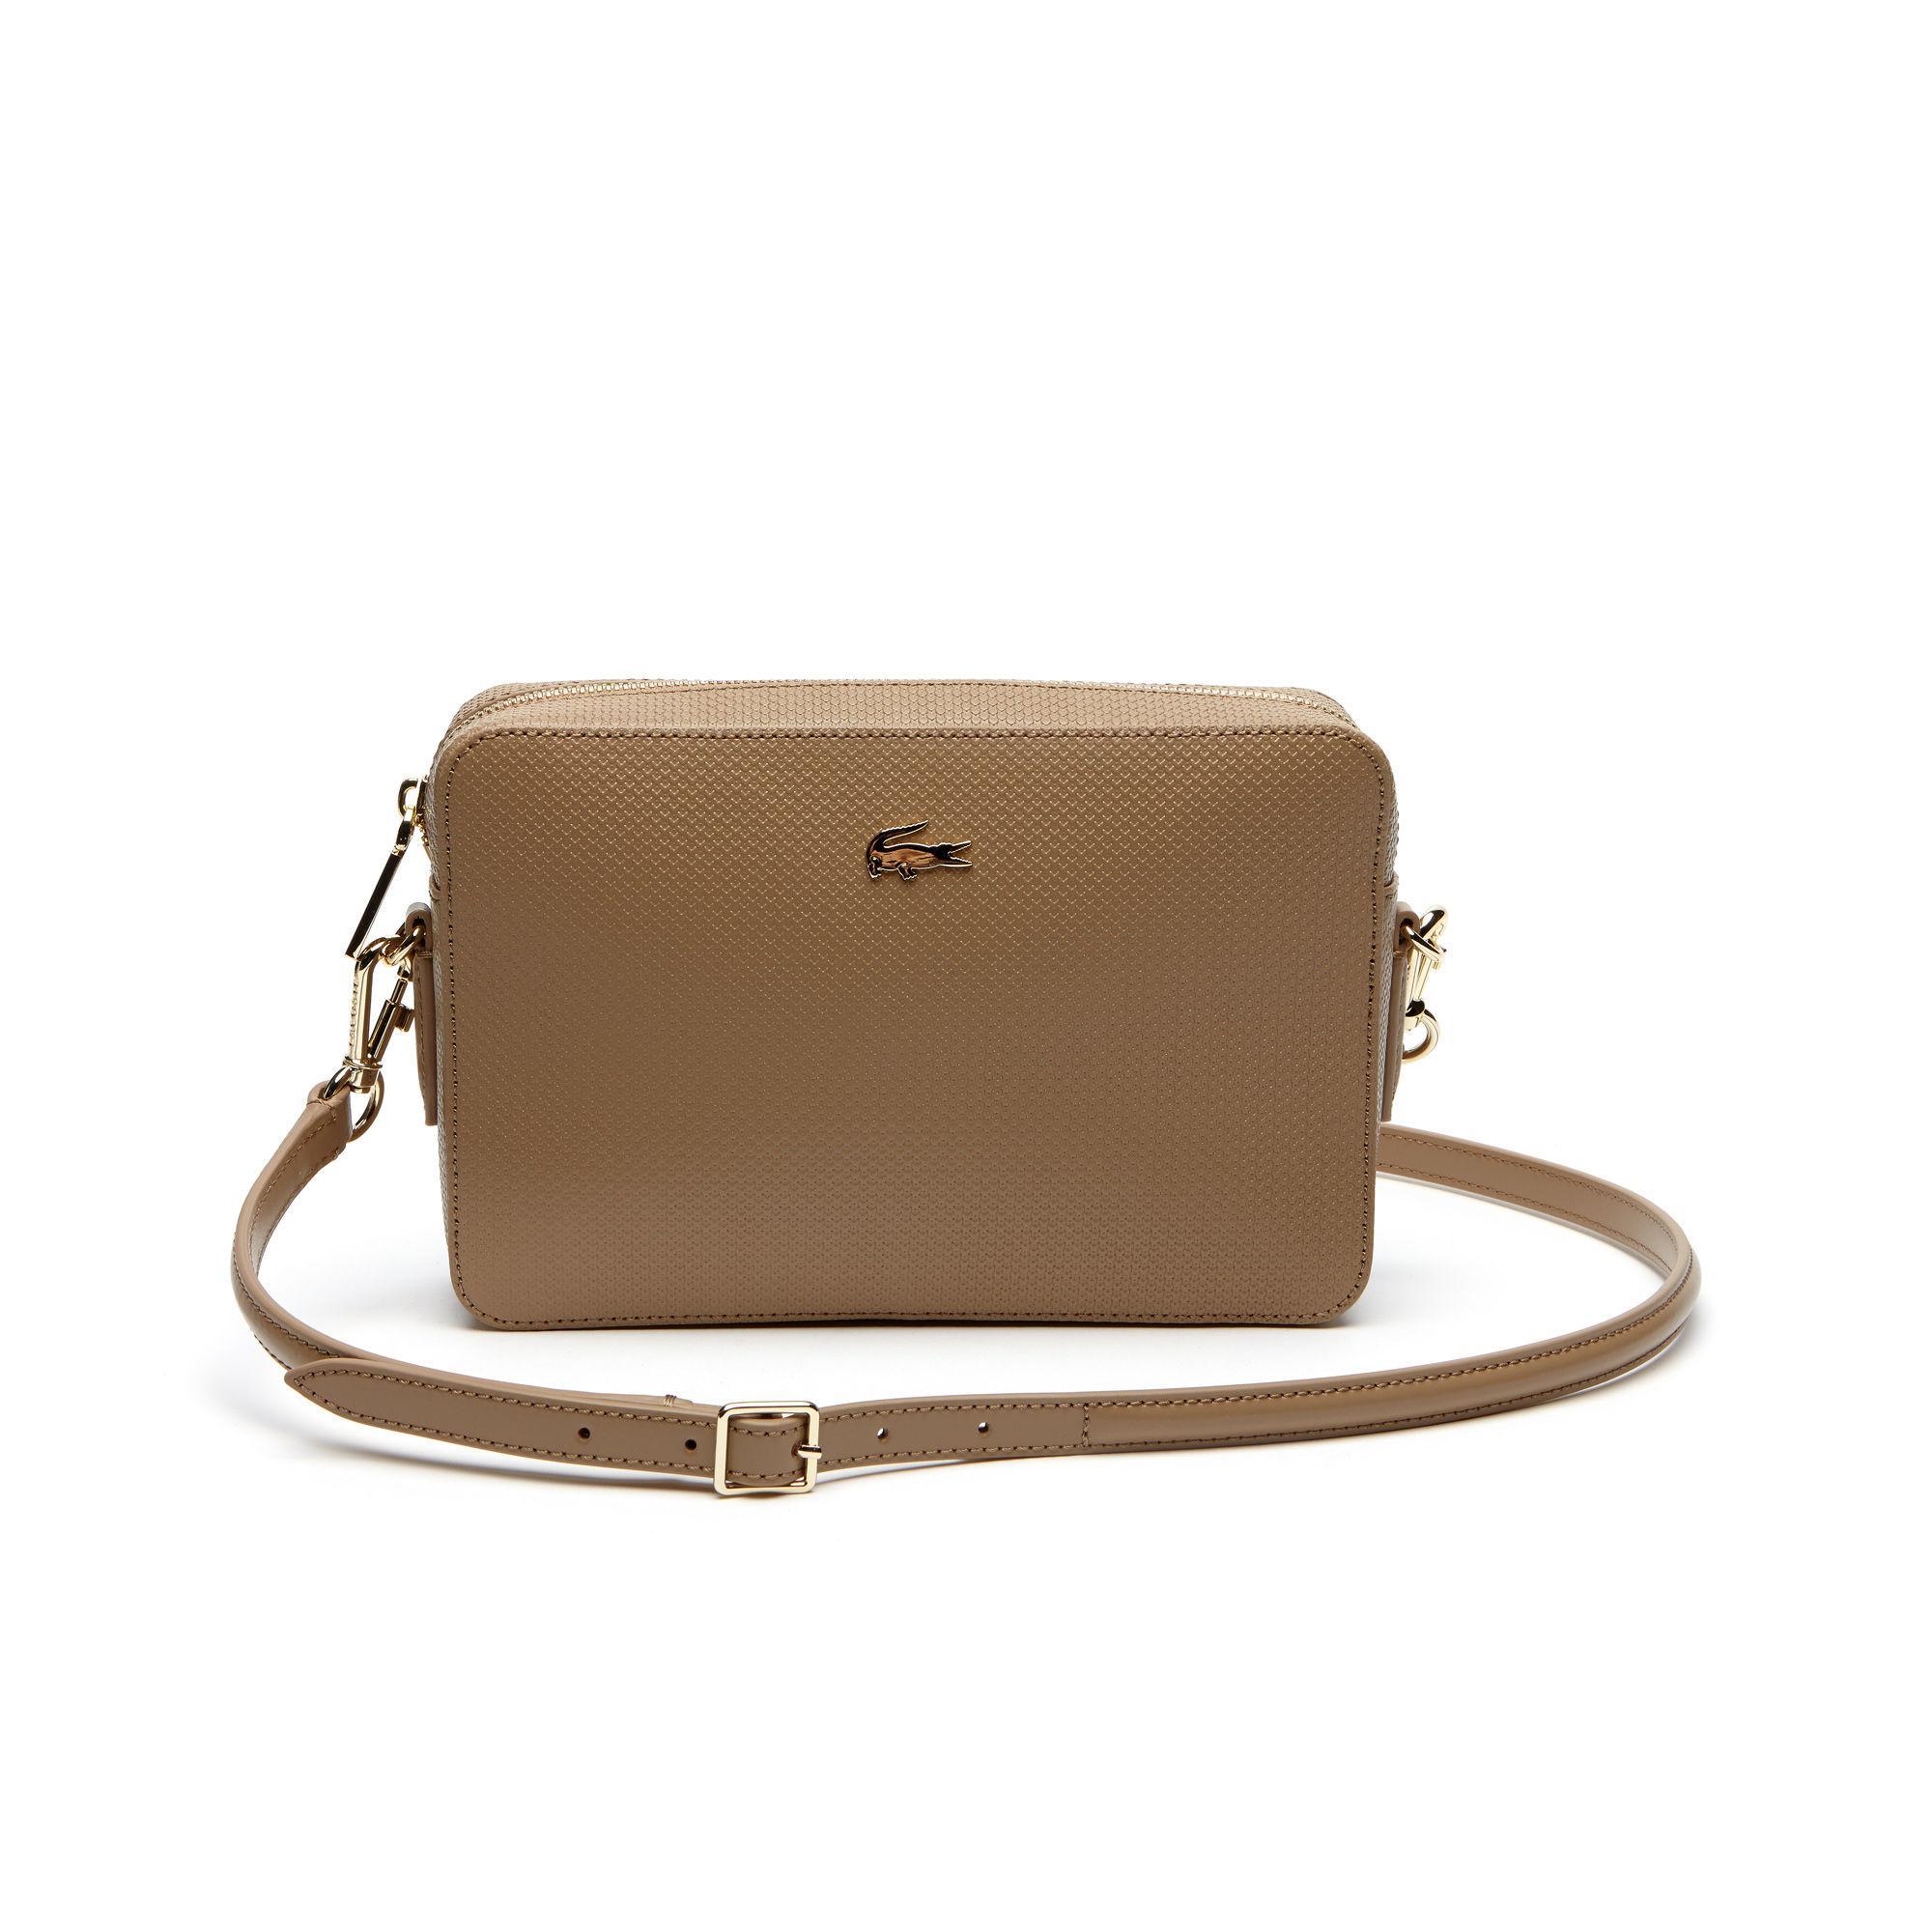 18b0d3a1f68e3 Lyst - Lacoste Chantaco Piqué Leather Square Crossover Bag